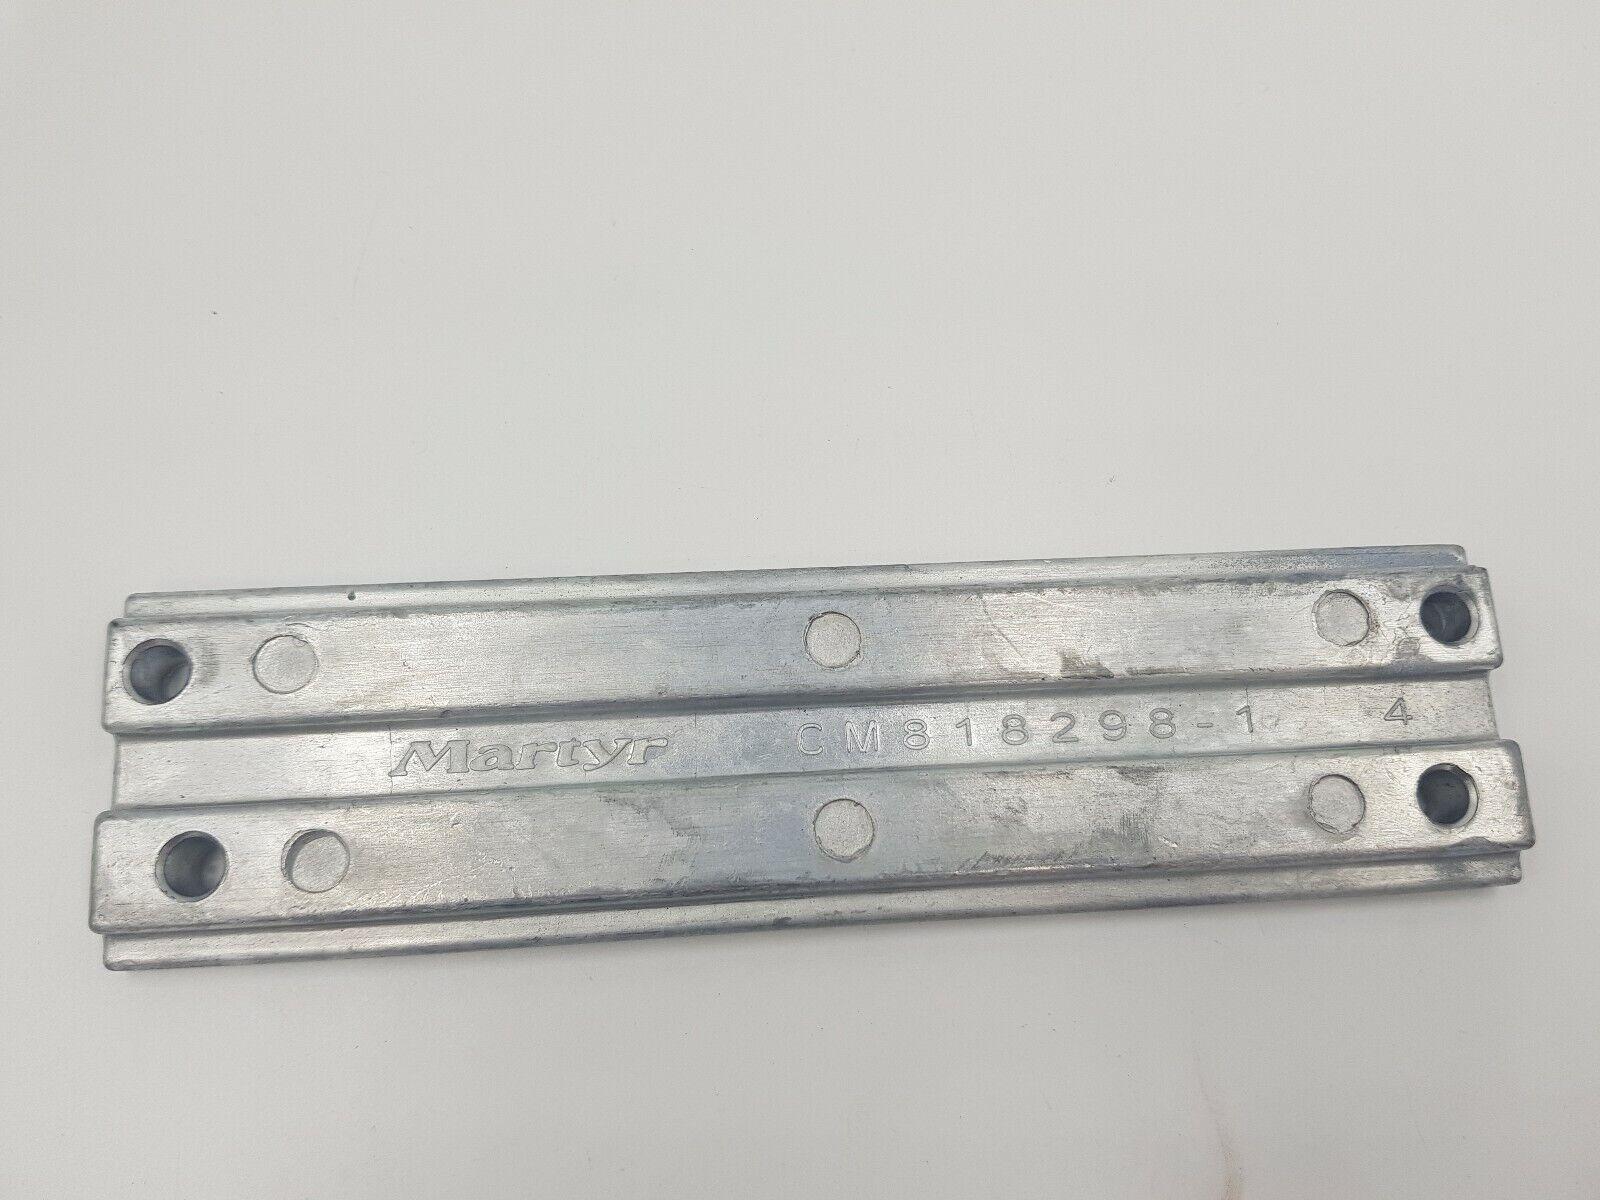 Sharplace Cubierta de Motor A Motor Fuera de Borda A Prueba de Agua Pieza Recambio